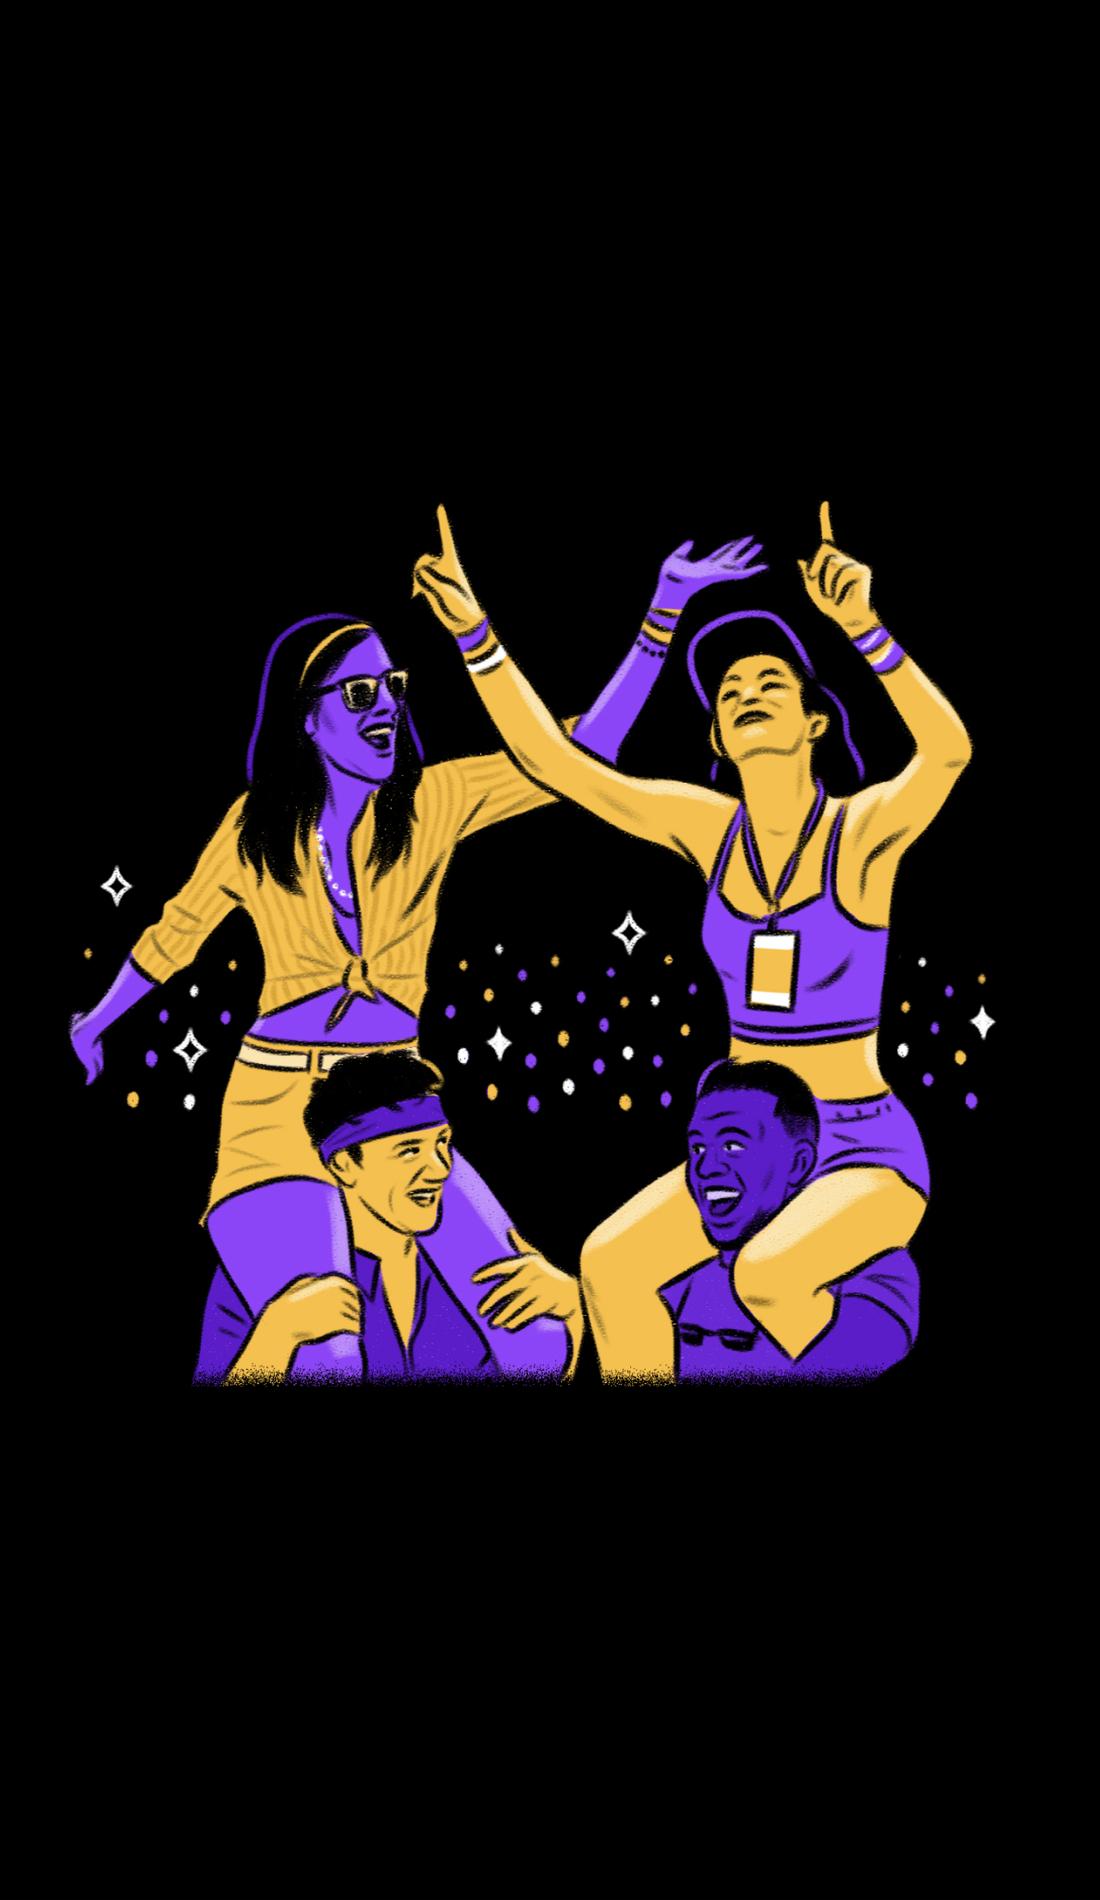 A Pitchfork Music Festival live event